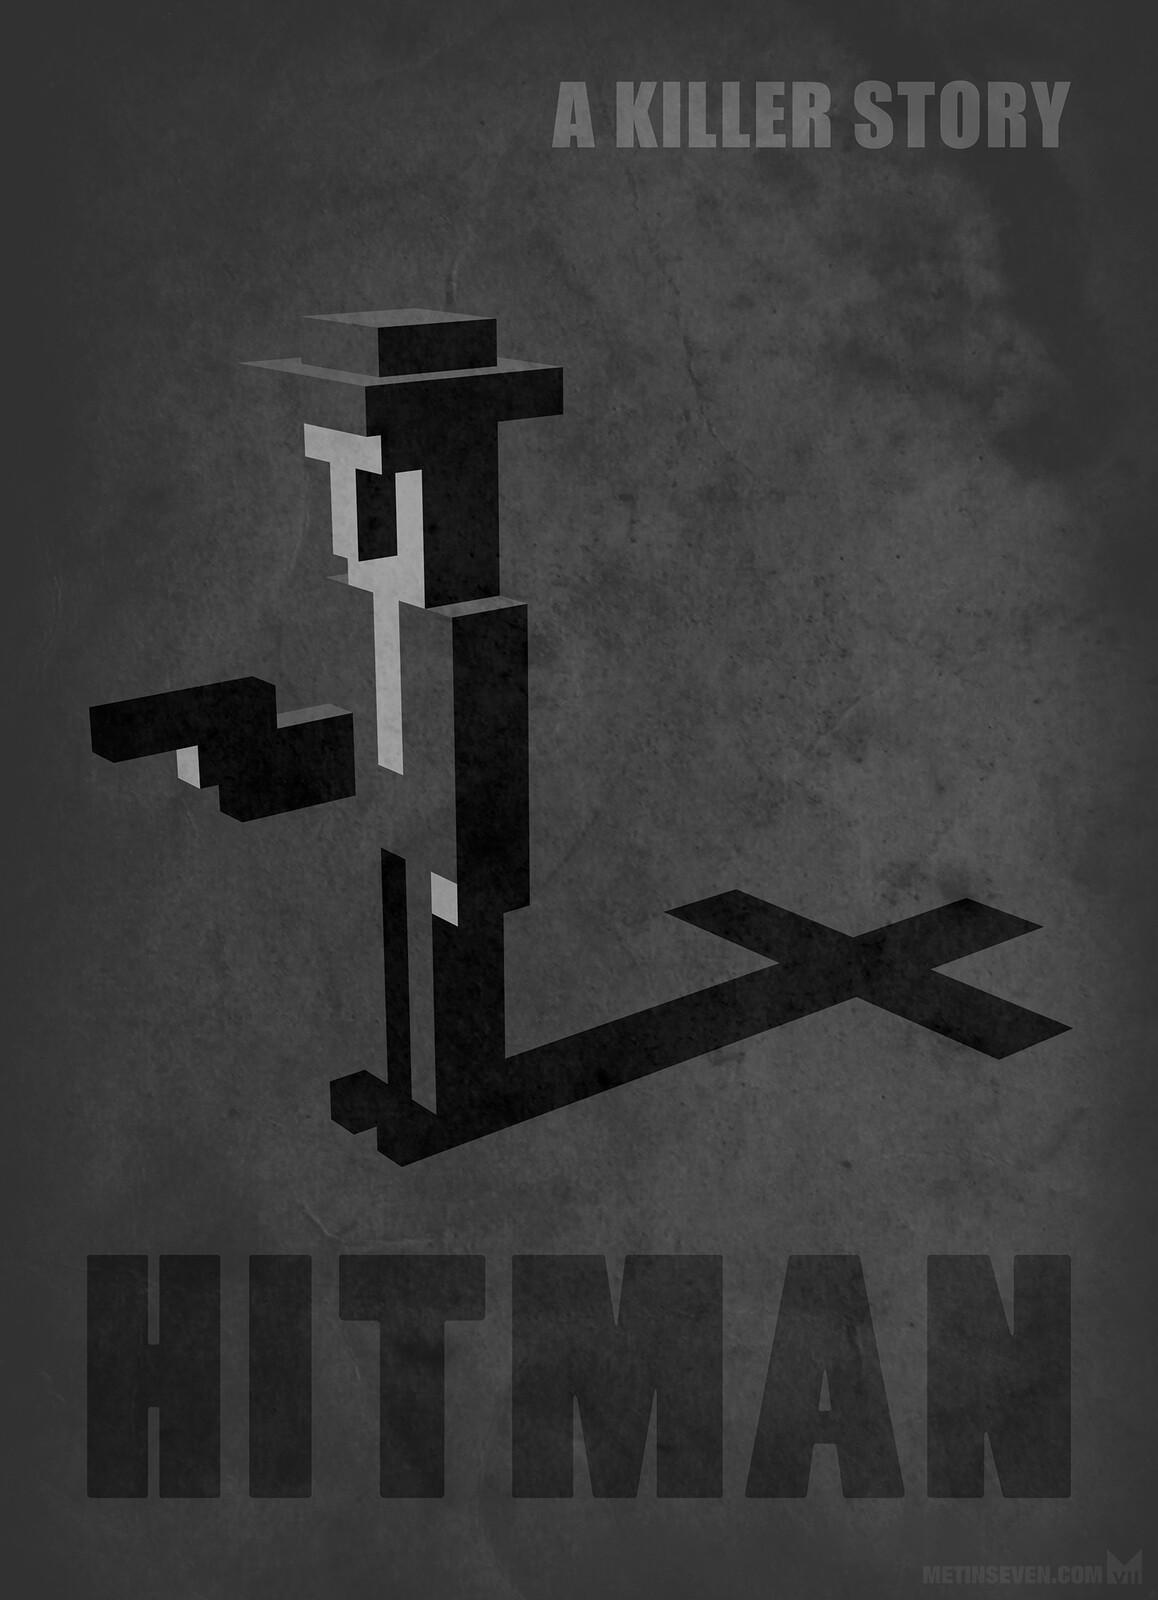 Hitman voxel-style poster design